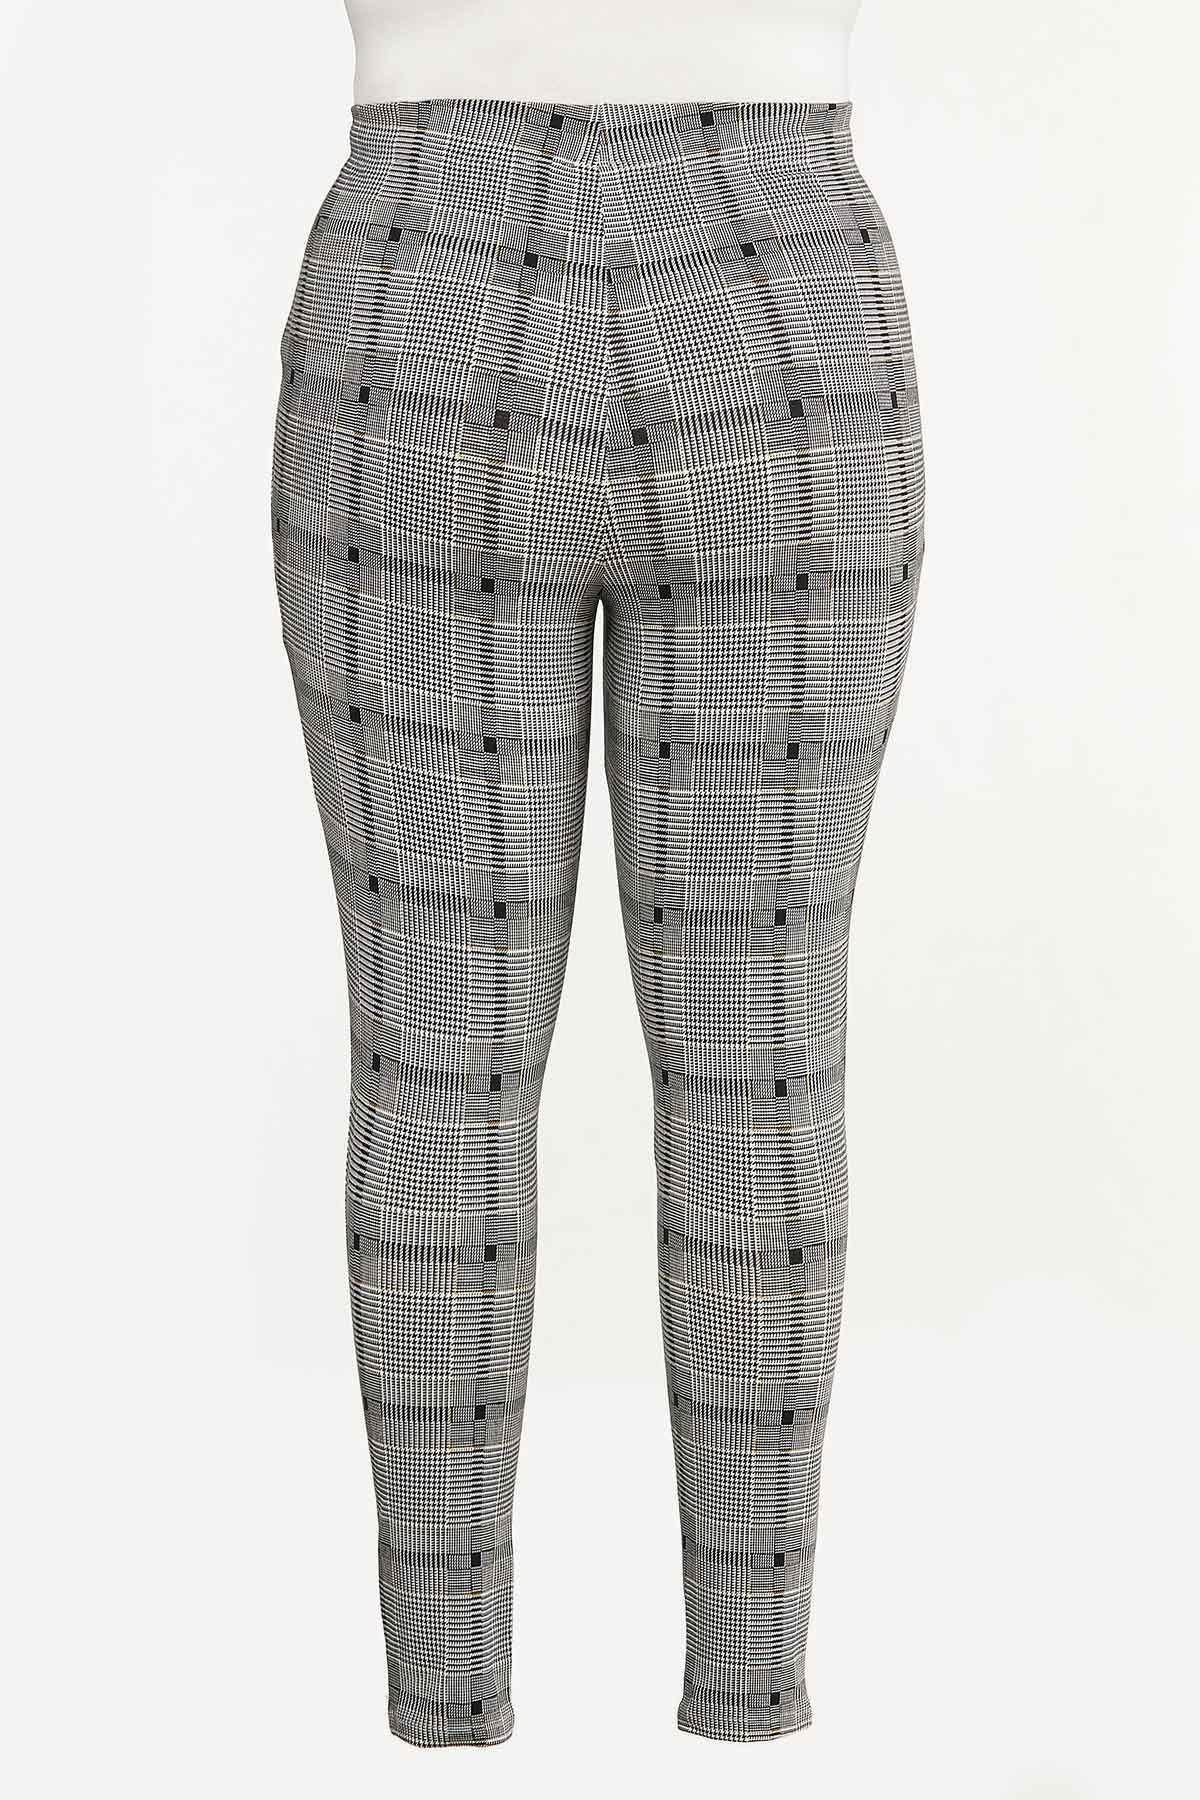 Plus Size Houndstooth Plaid Leggings (Item #44655137)